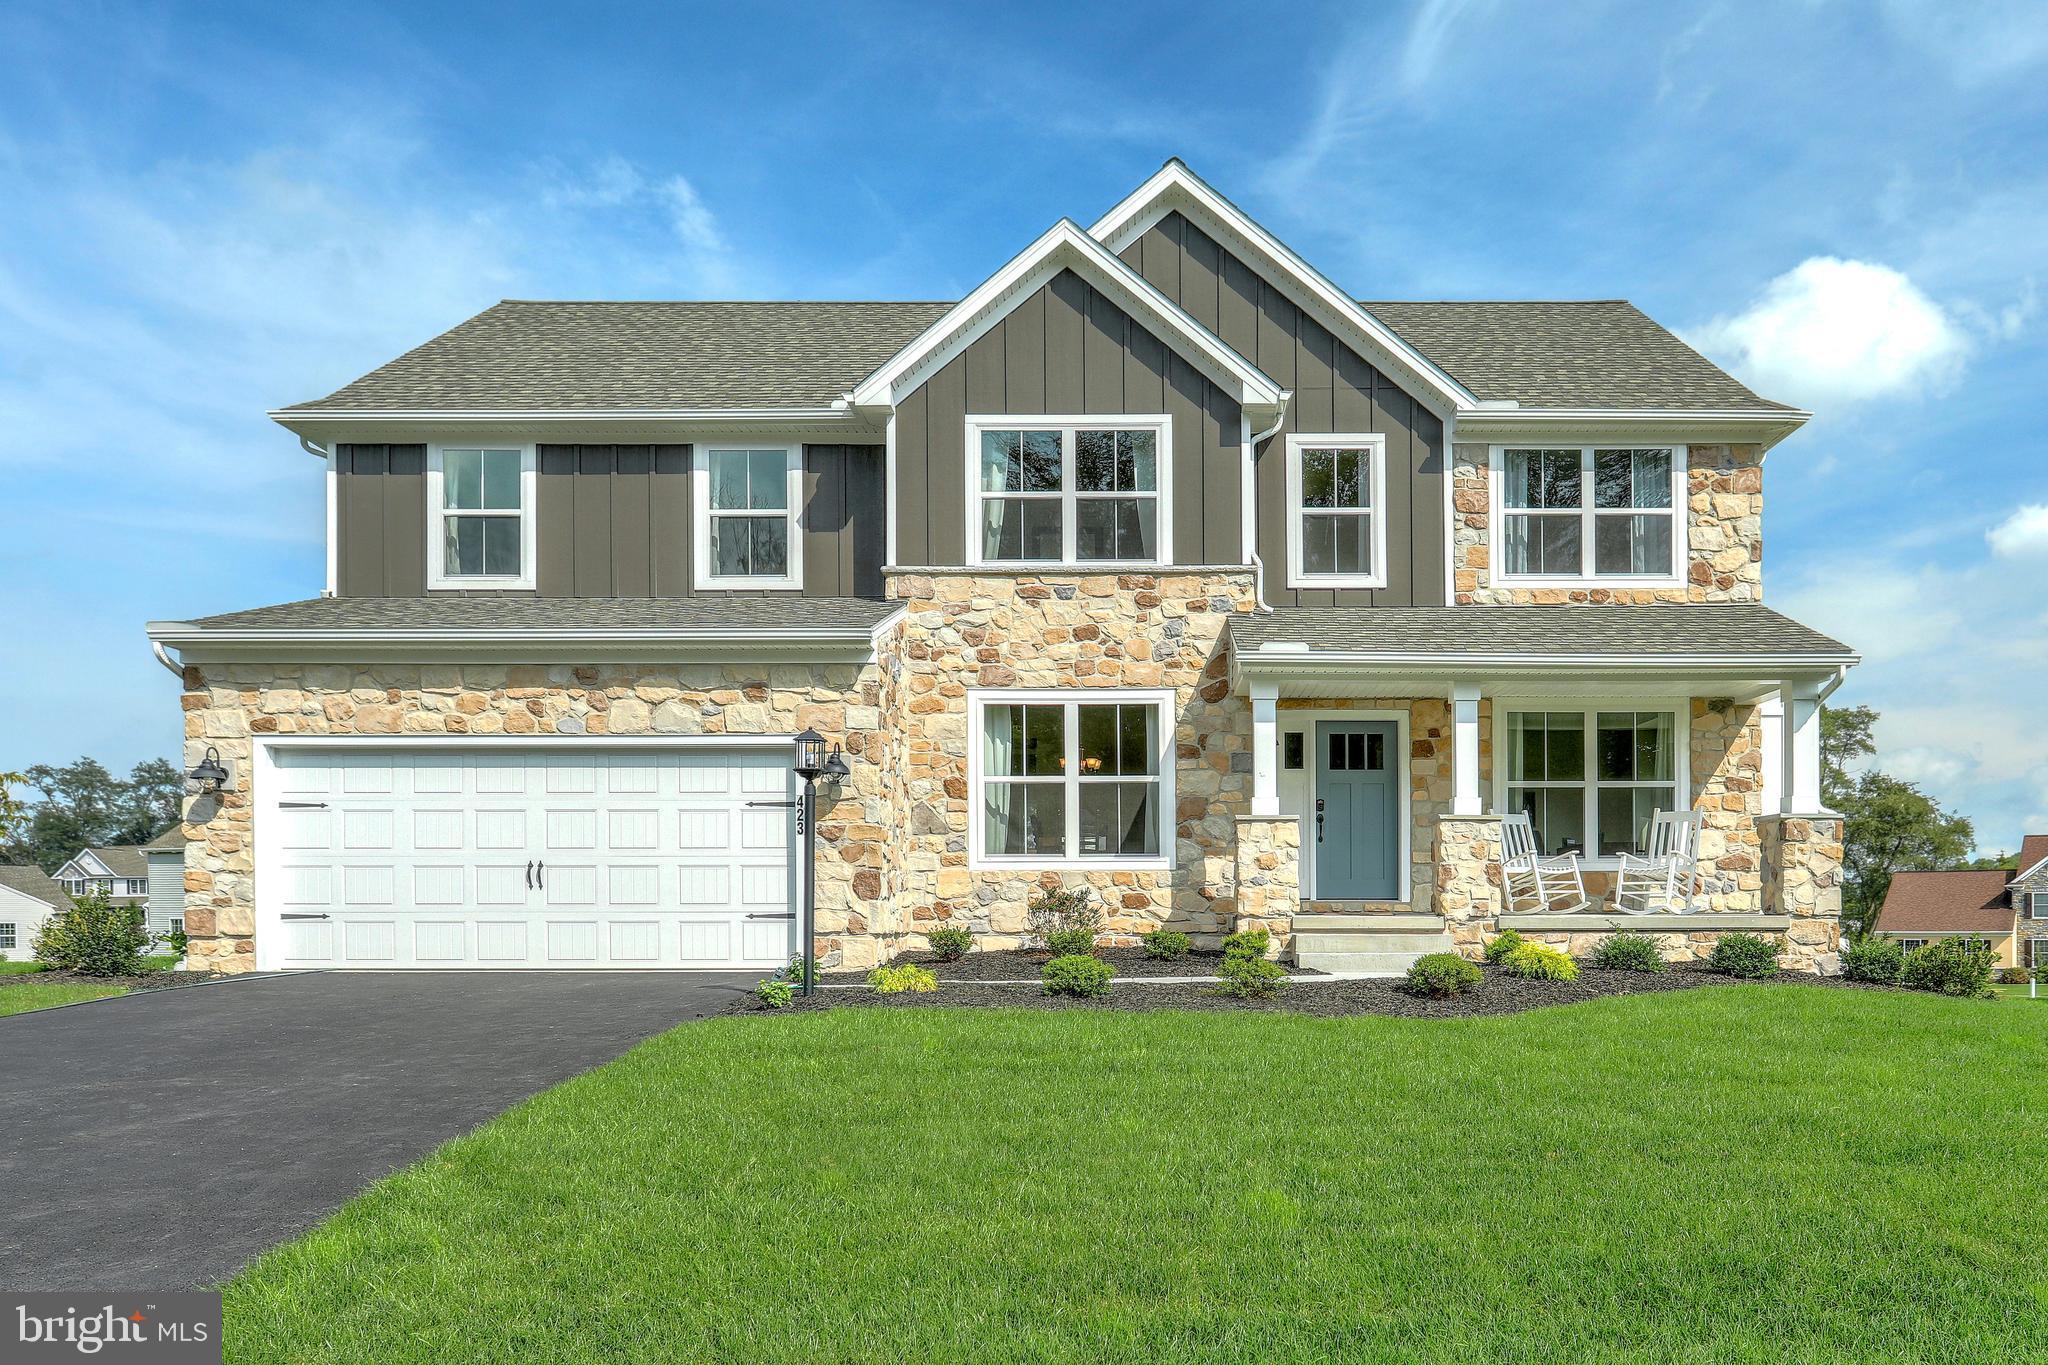 Photo similar to home - Logan Meadows model home.